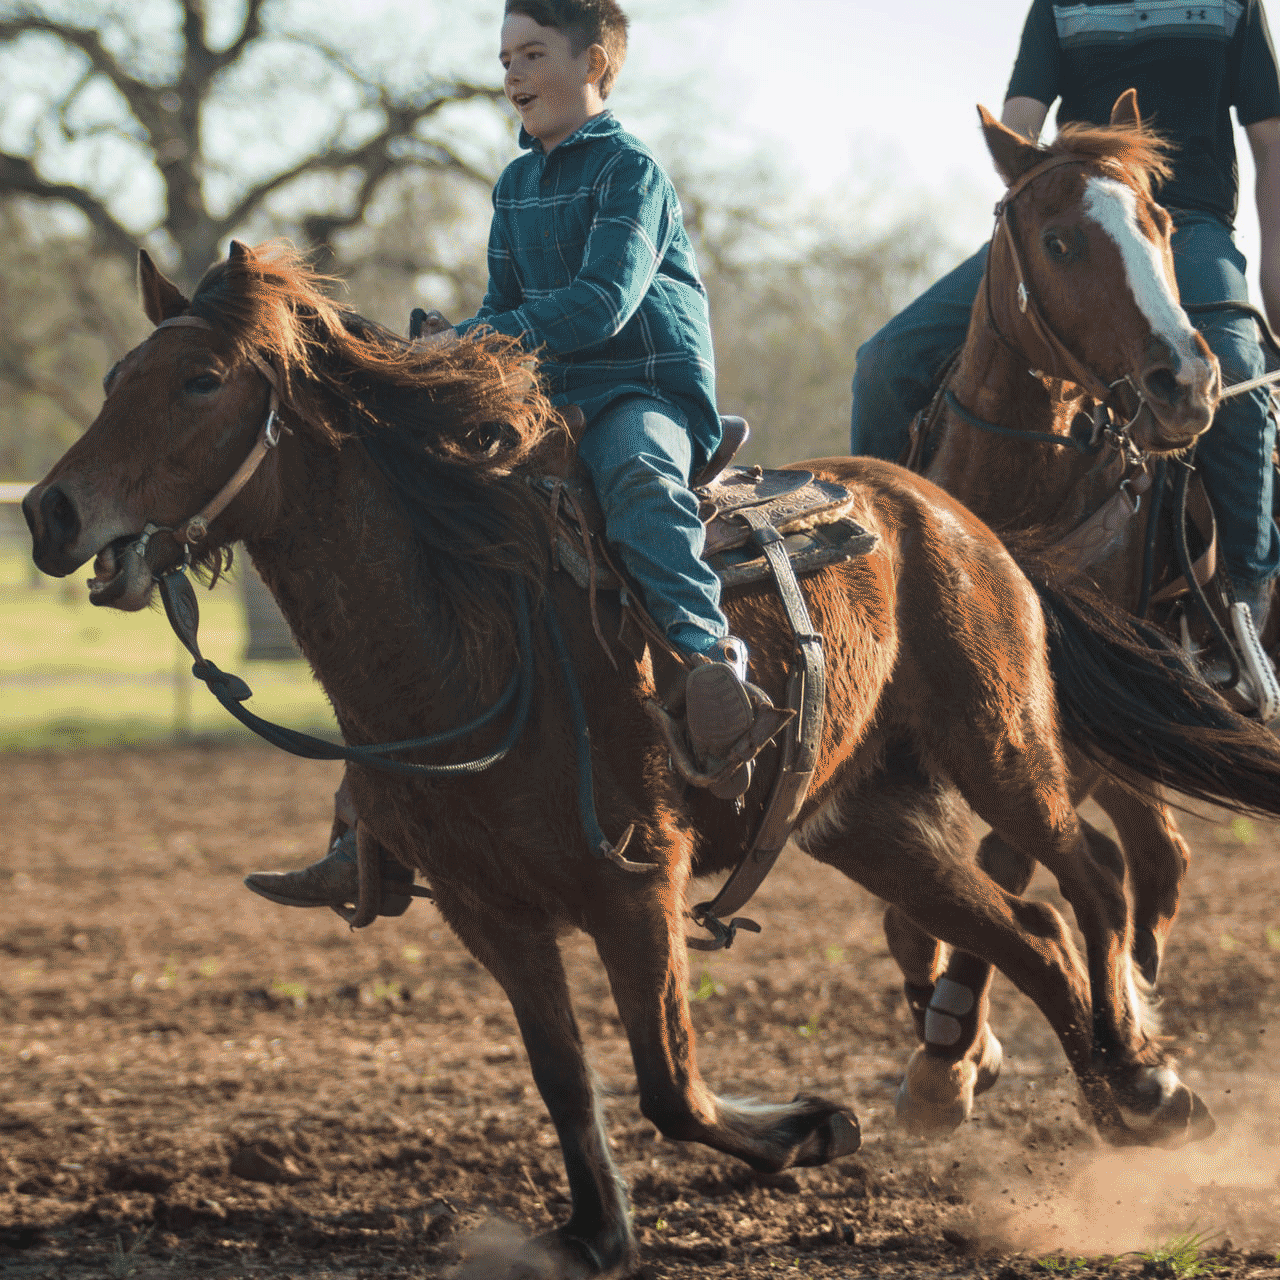 A boy on a western saddled horse